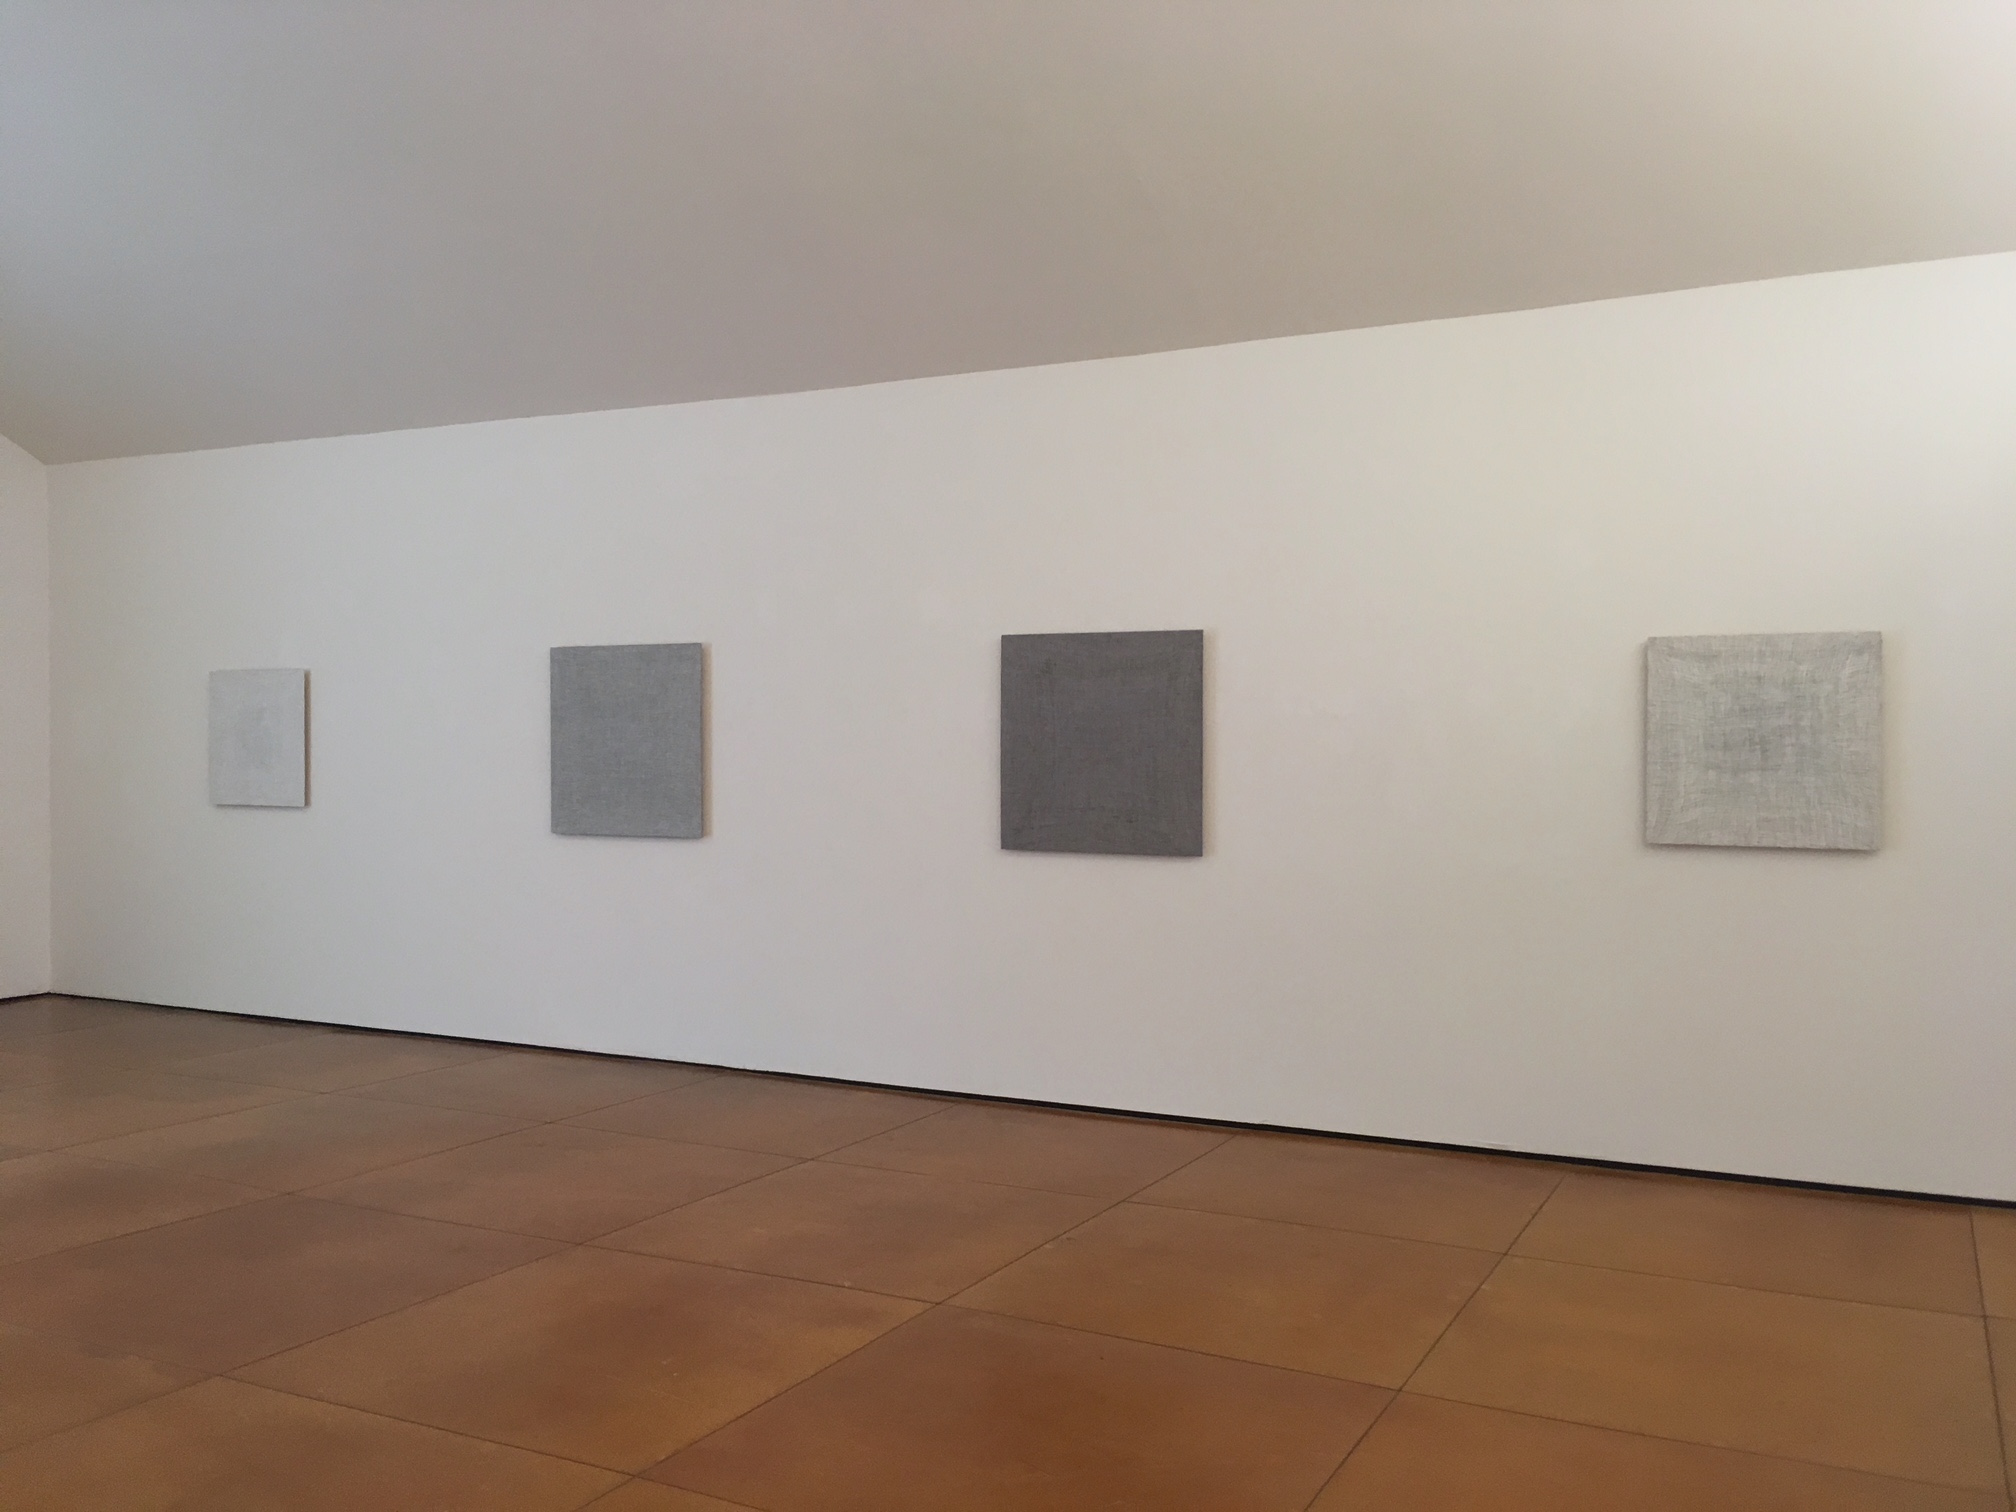 Hiram Butler Gallery Veils October 6 - November 24, 2018